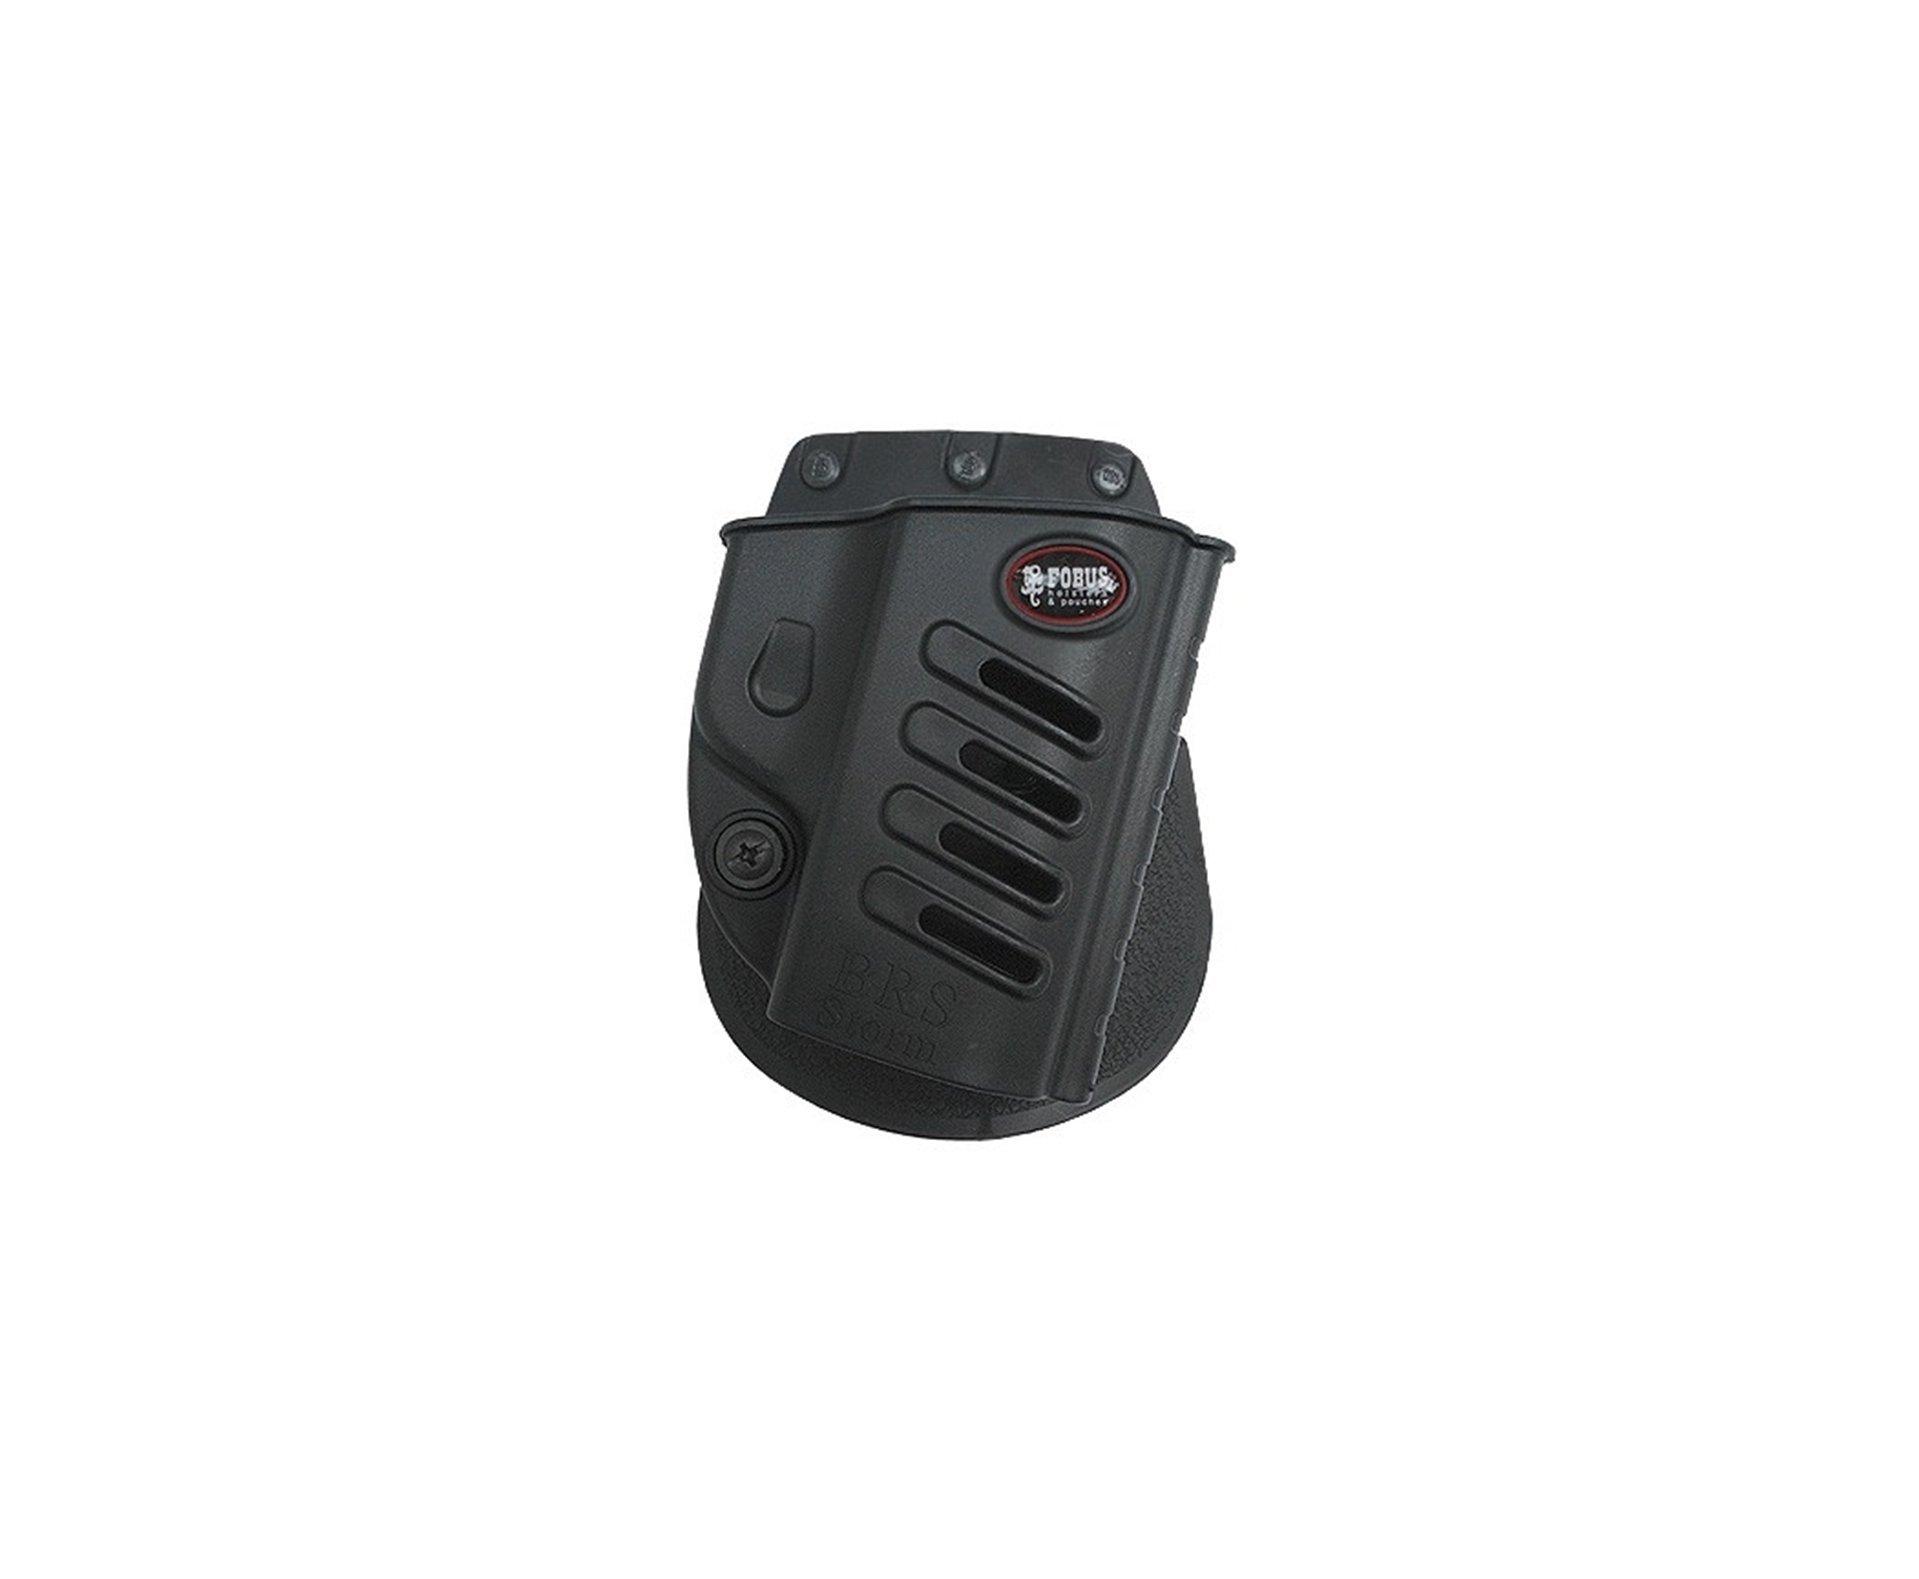 Coldre De Cintura Fobus Rotativo Beretta PX4/F/SD/Inox/M9/92A1/96A1/92FS